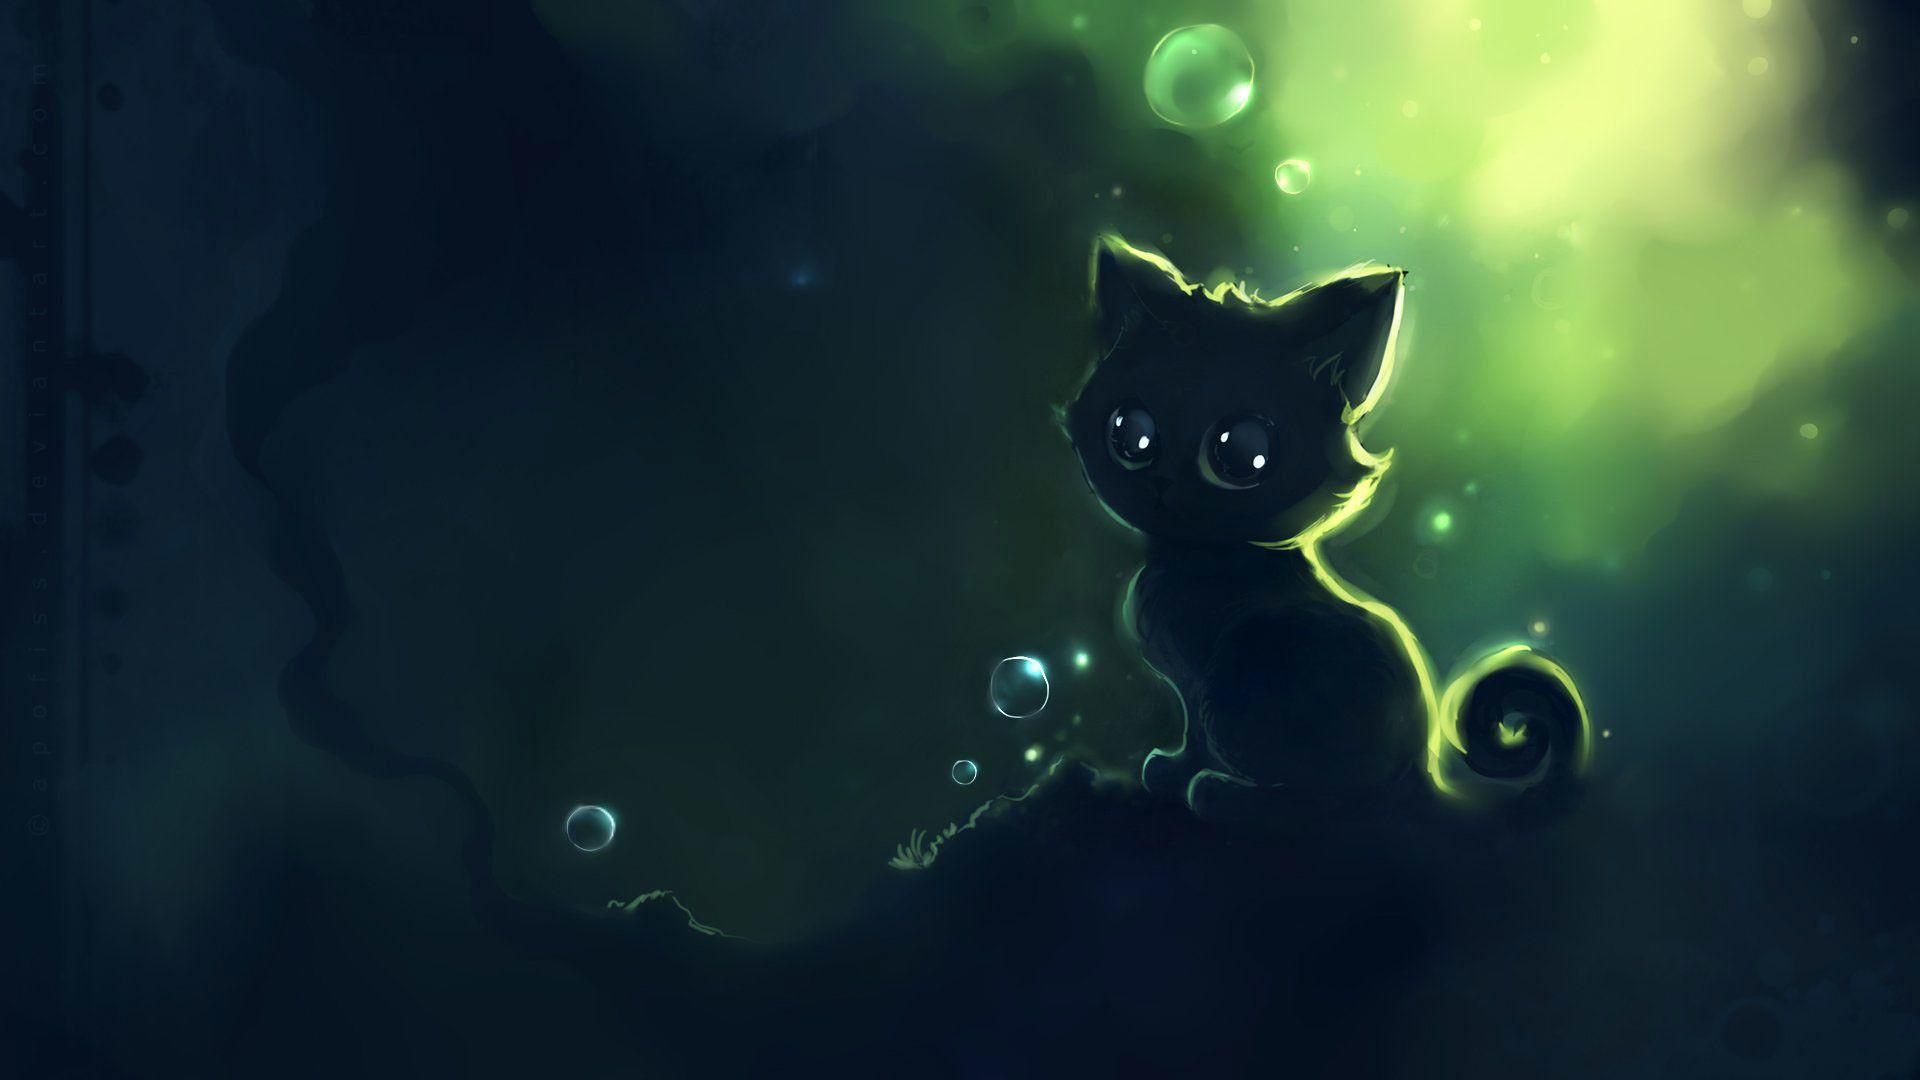 1920x1080 Cartoon Wallpapers Images Hd 1080p Cute Anime Cat Anime Kitten Cat Art